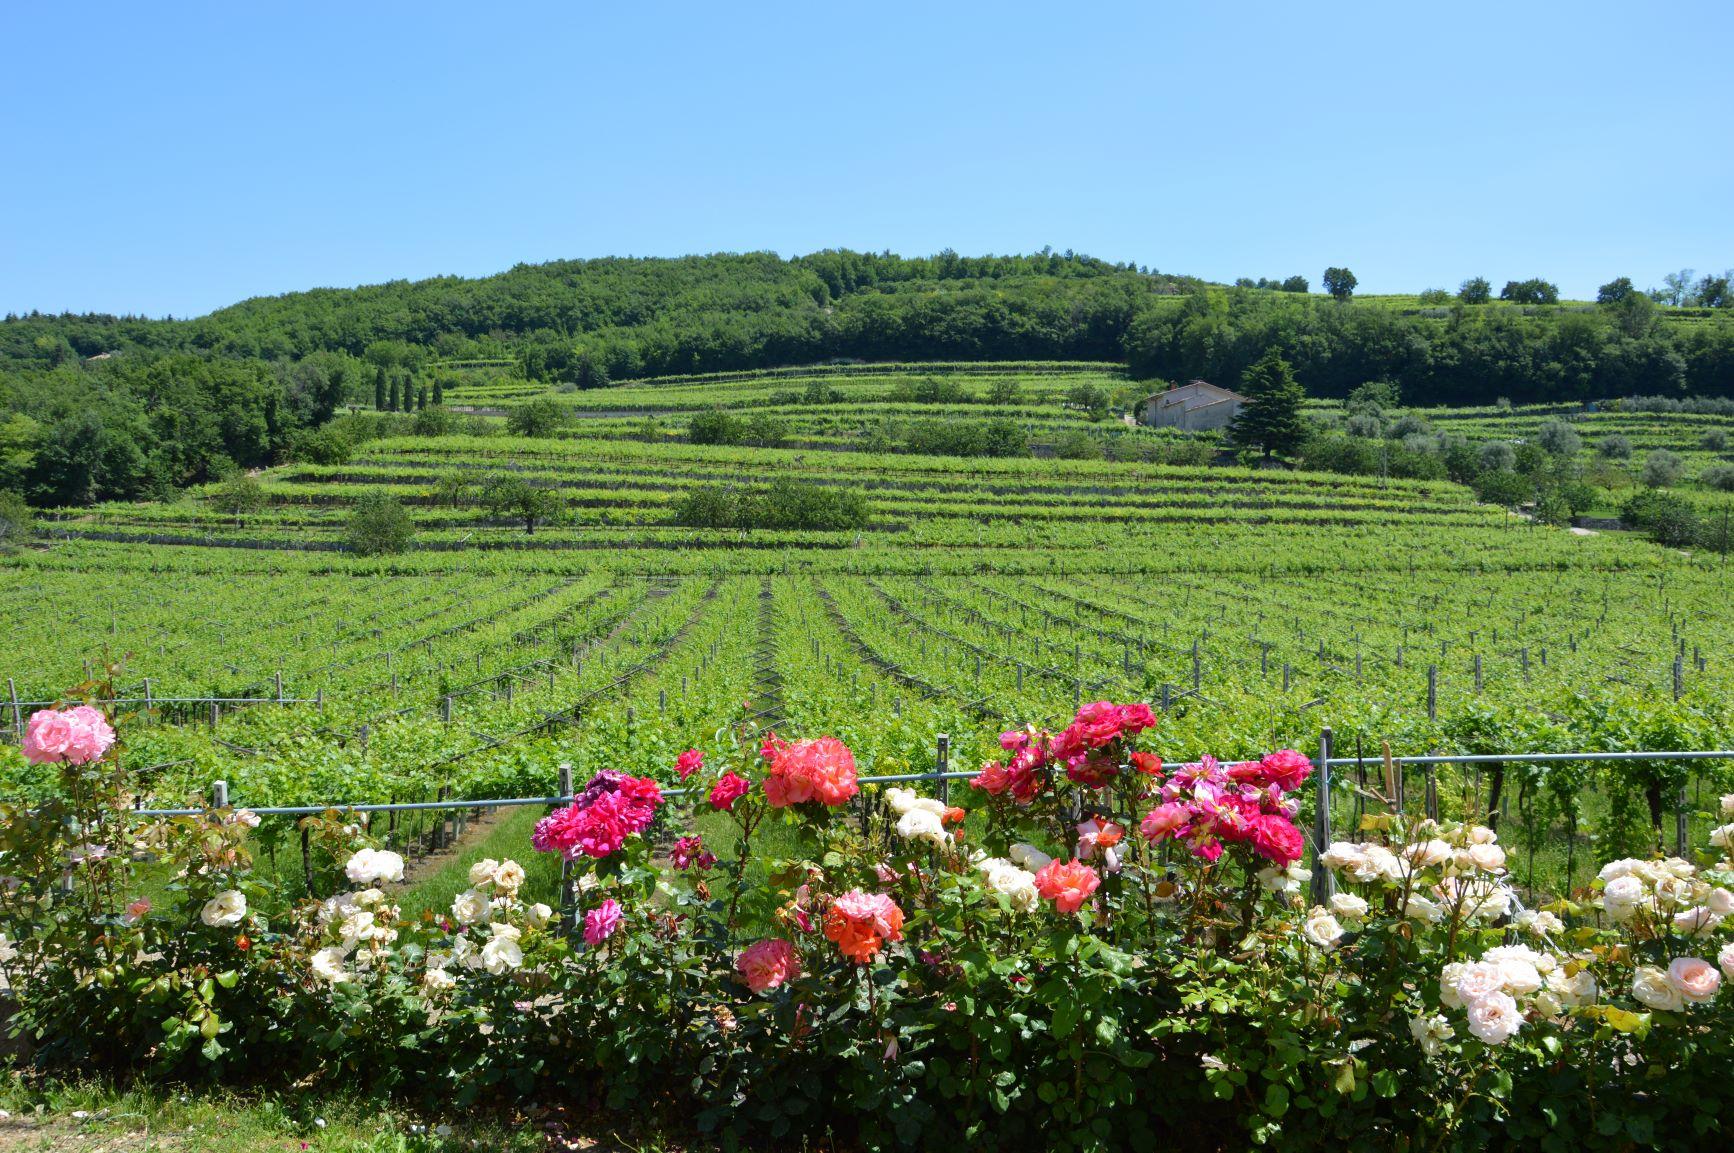 Le Marognole winery: Opposites attract!